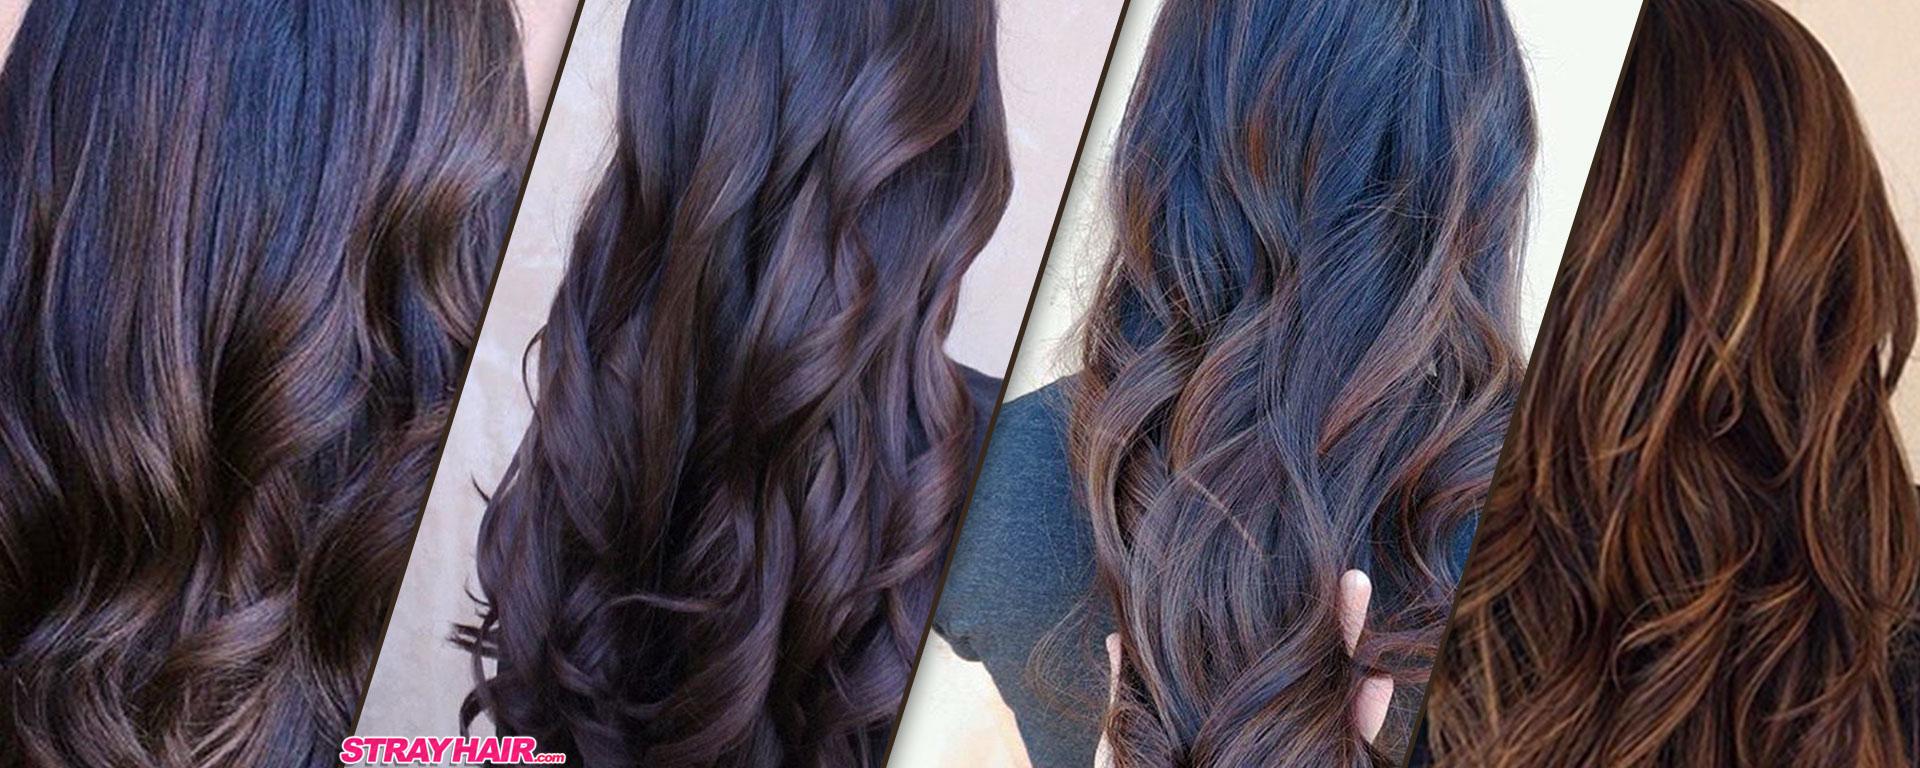 Beautiful Chocolate And Caramel Balayage Hair Strayhair